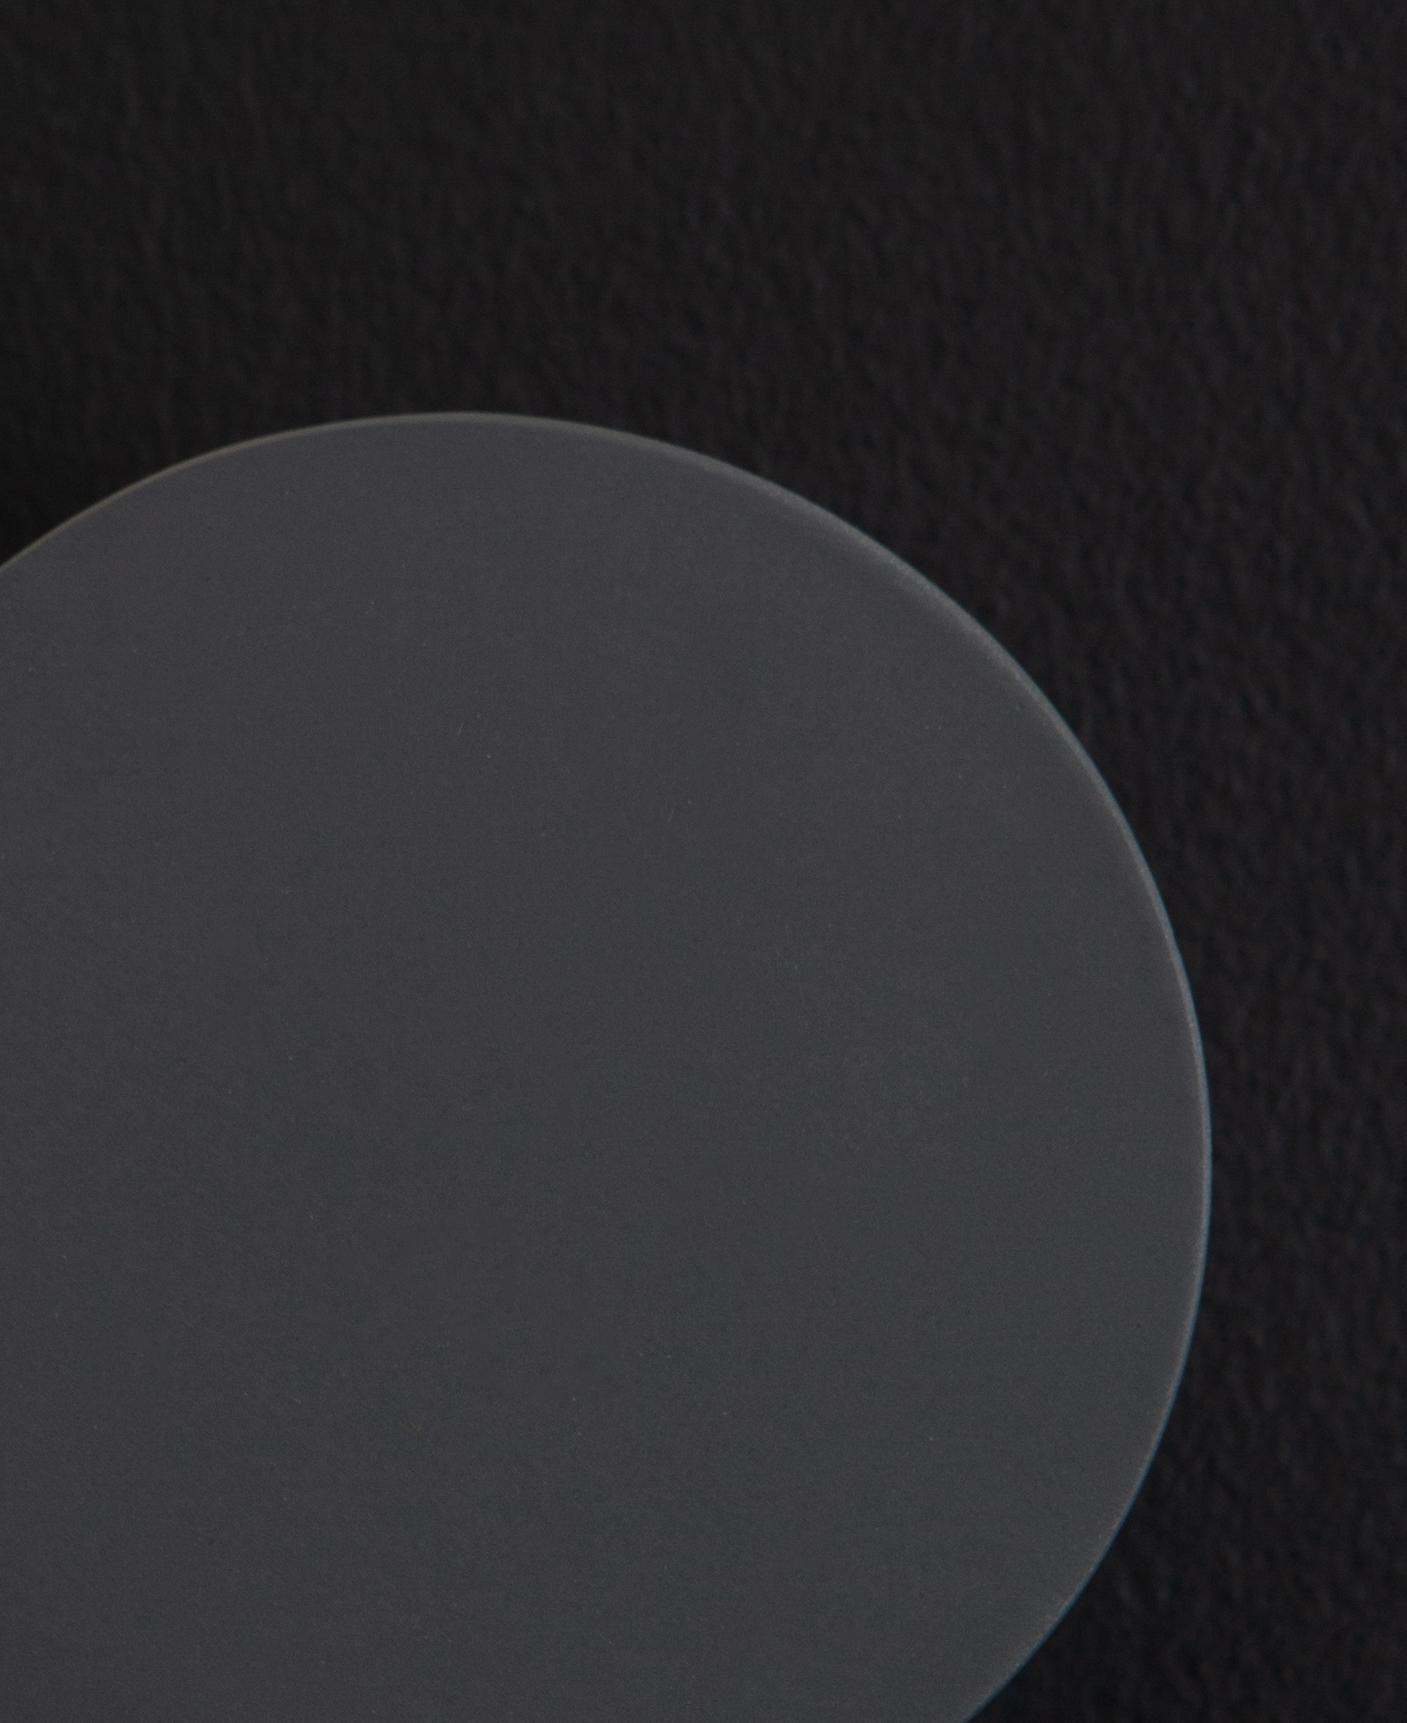 close up image of gunmetal blomus wall towel hooks on a black background